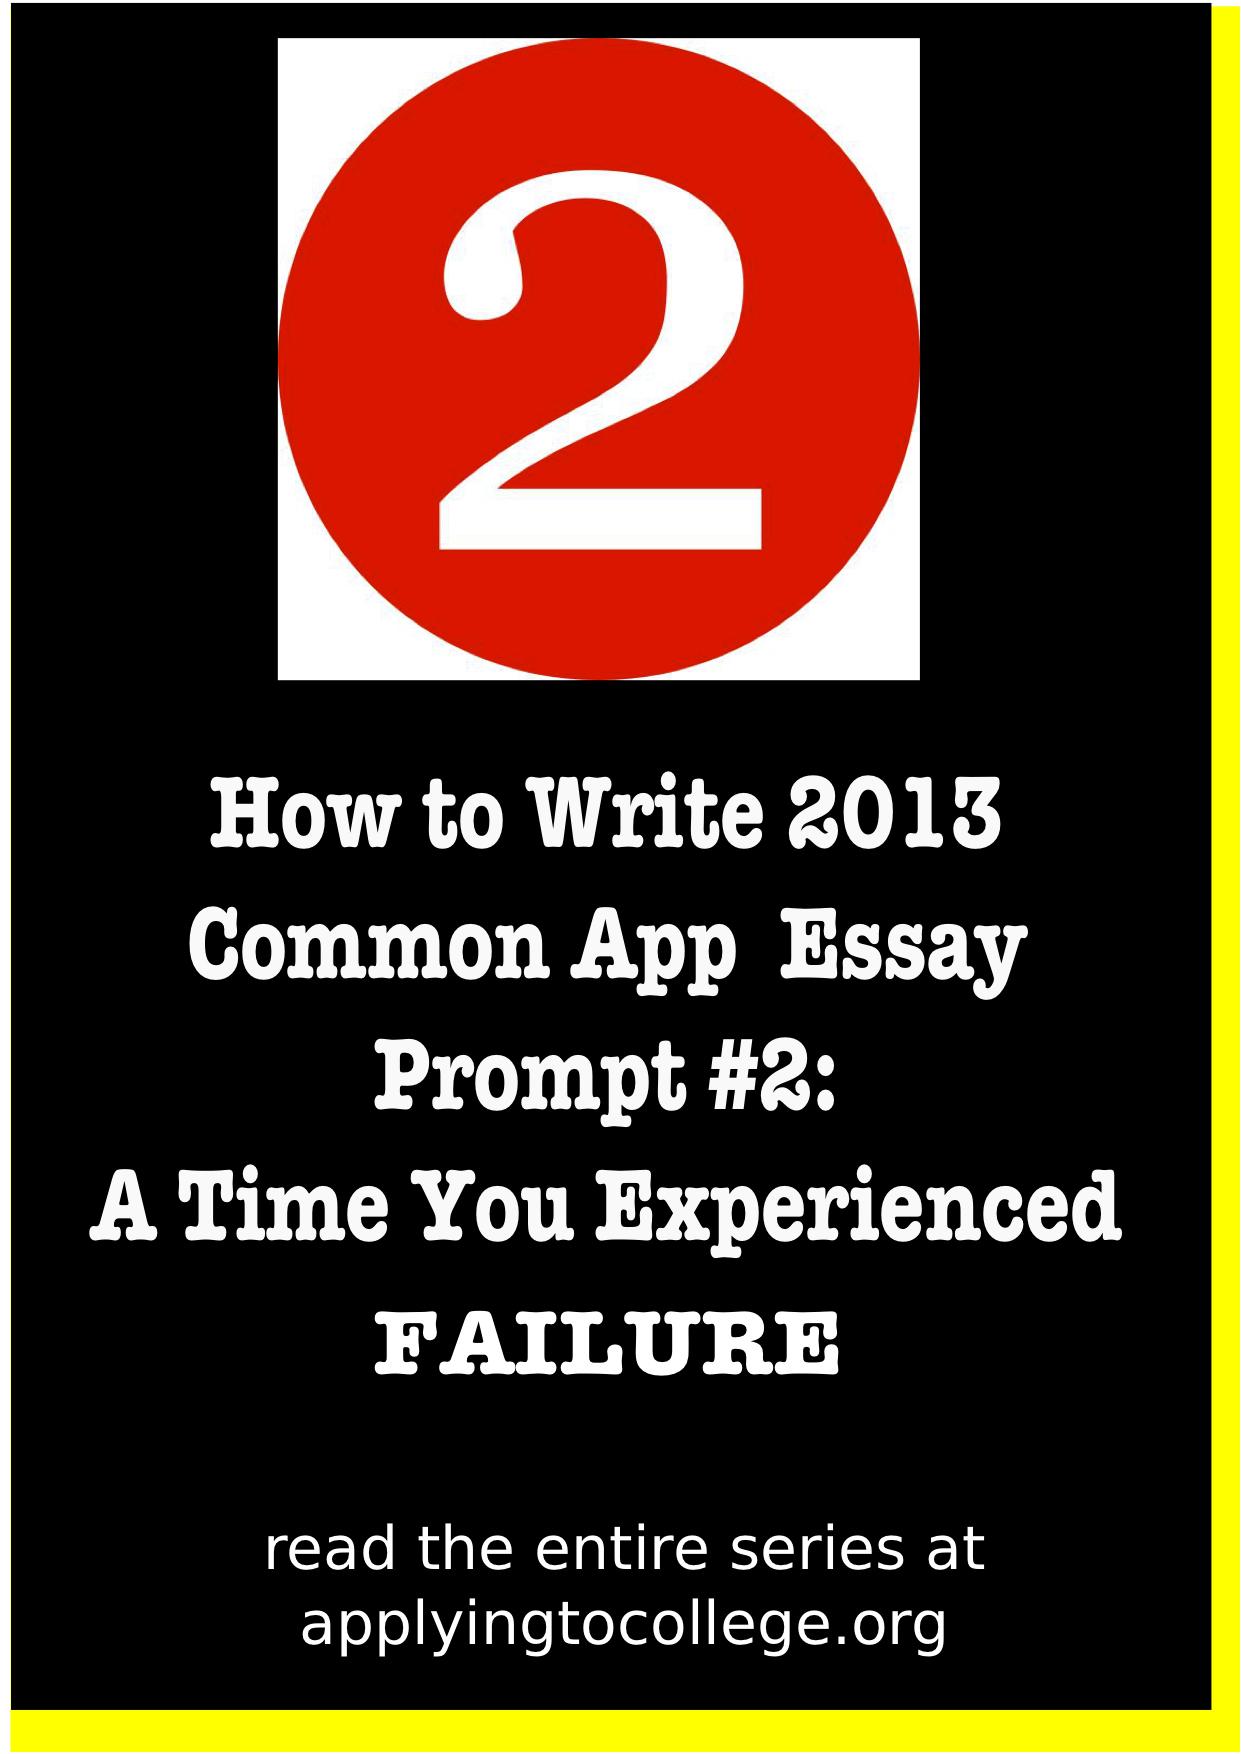 019 How To Write Common App Failure Essay1 Essay Example Prompts Rare 2015-16 Full